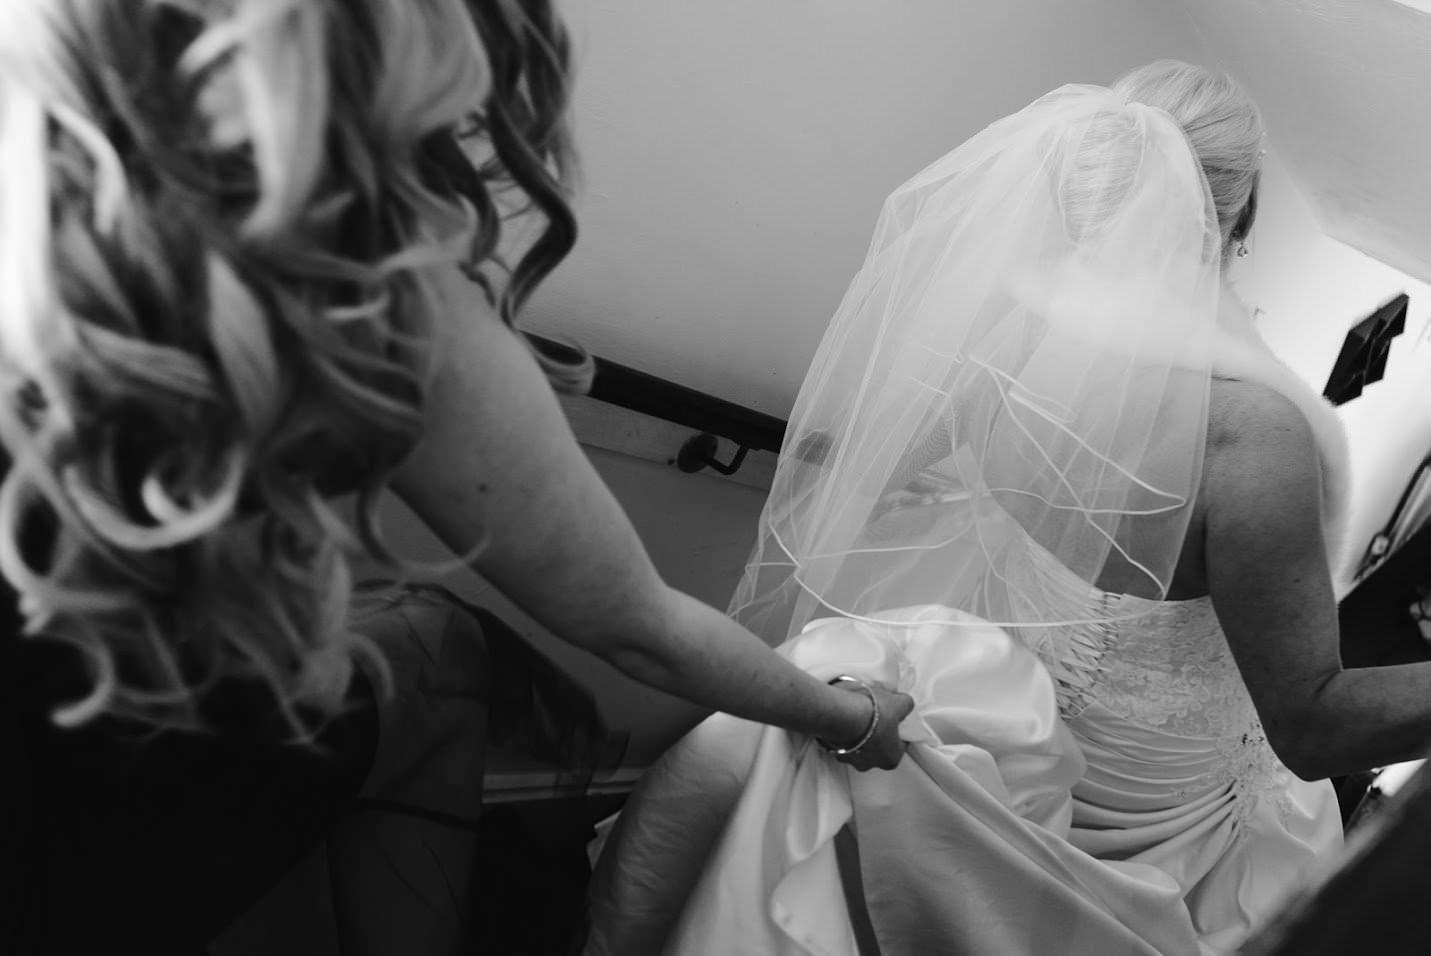 MarkHeather 151023 - Solihull Registry Office Wedding - Mark & Heather